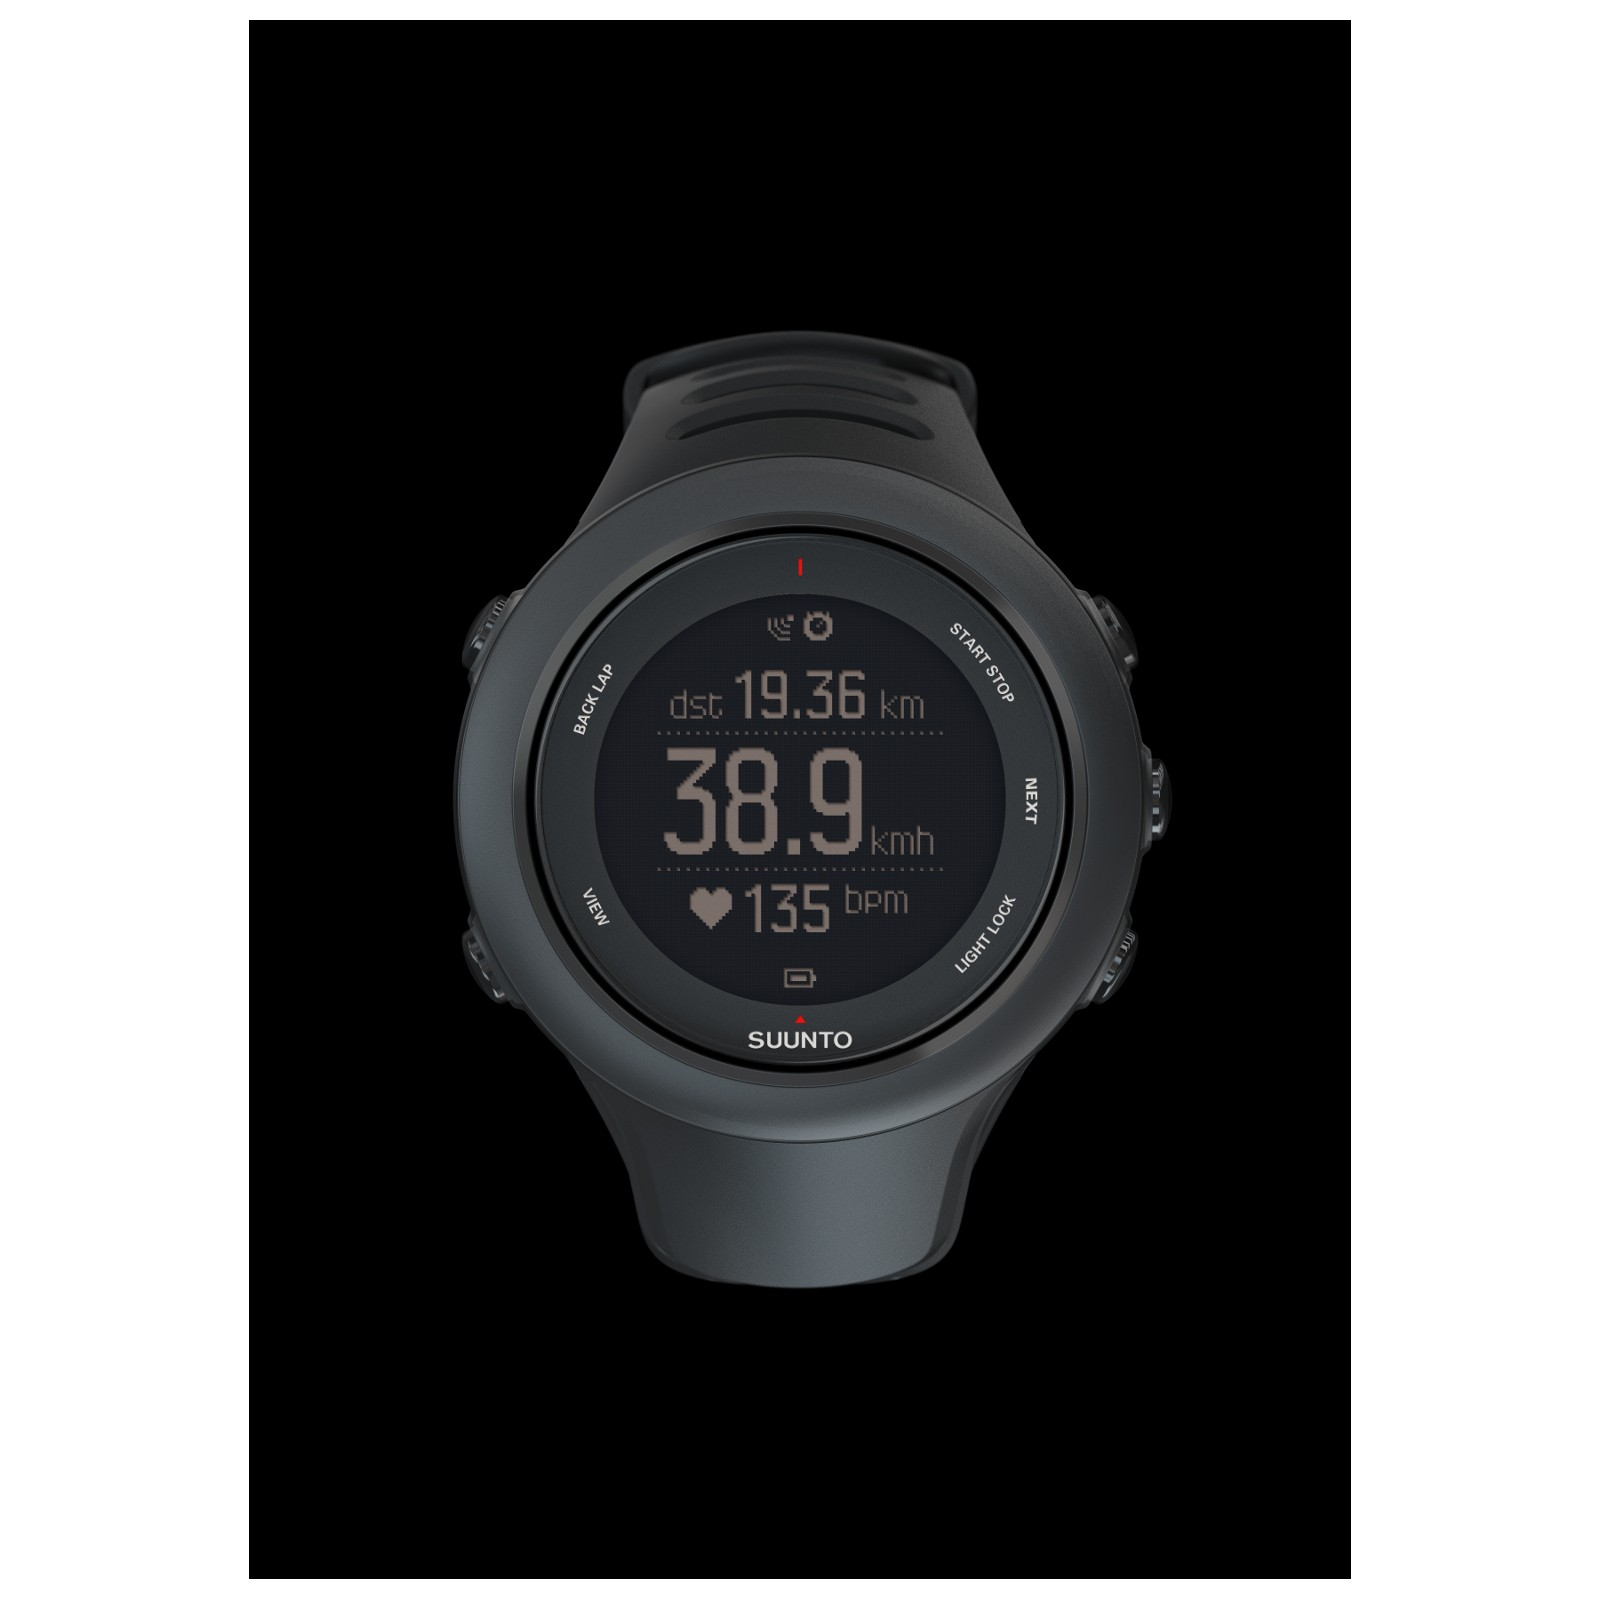 Suunto Ambit 3 Sport Inkl Brustgurt Tiedje Ambit3 Black Hr Gps Watch For Multisport Produktbild Loading Zoom